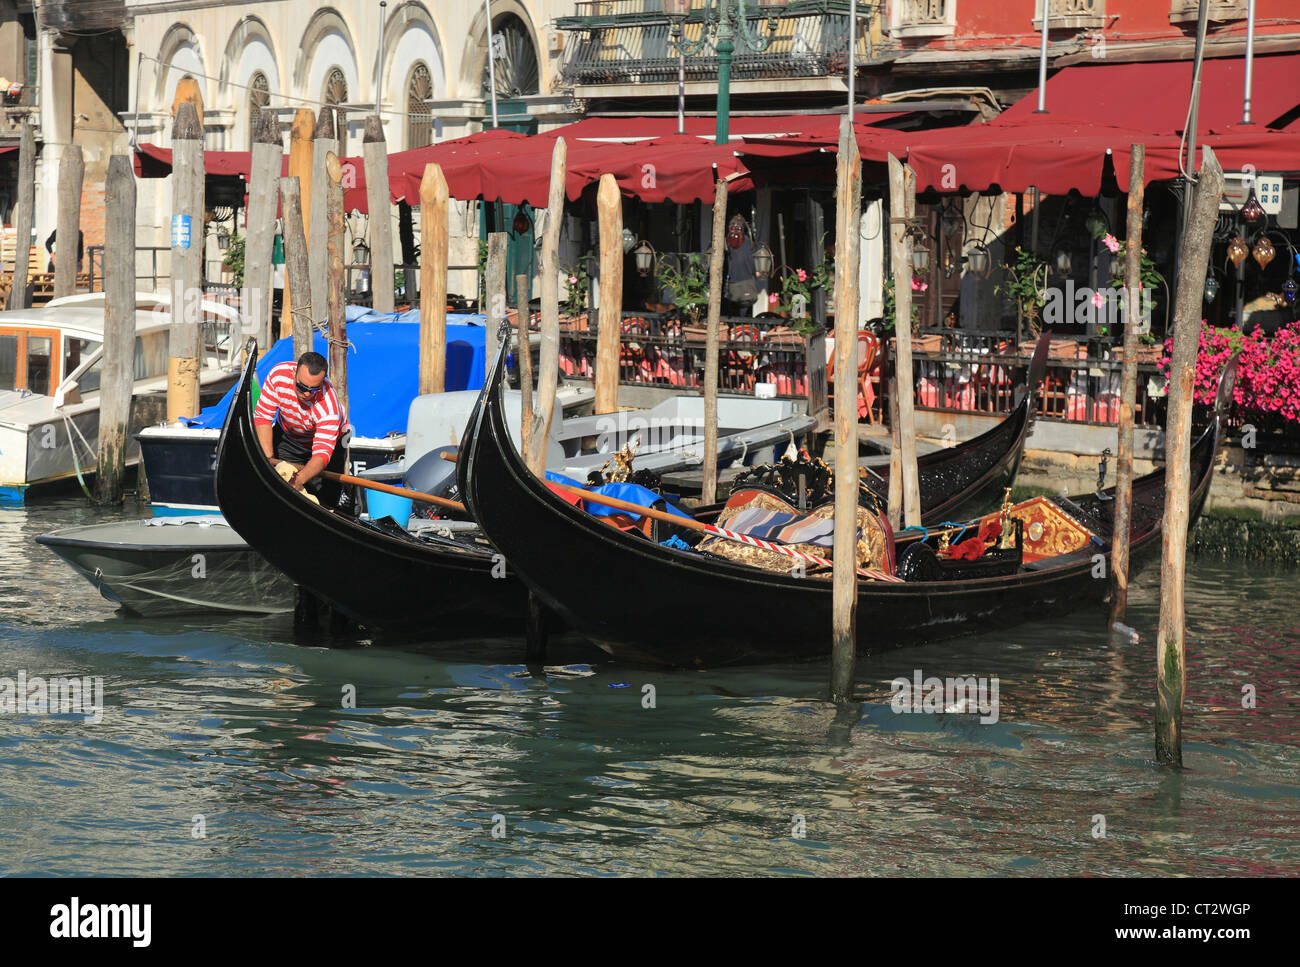 Gondolier preparing gondolas for trip on Grand Canal. - Stock Image